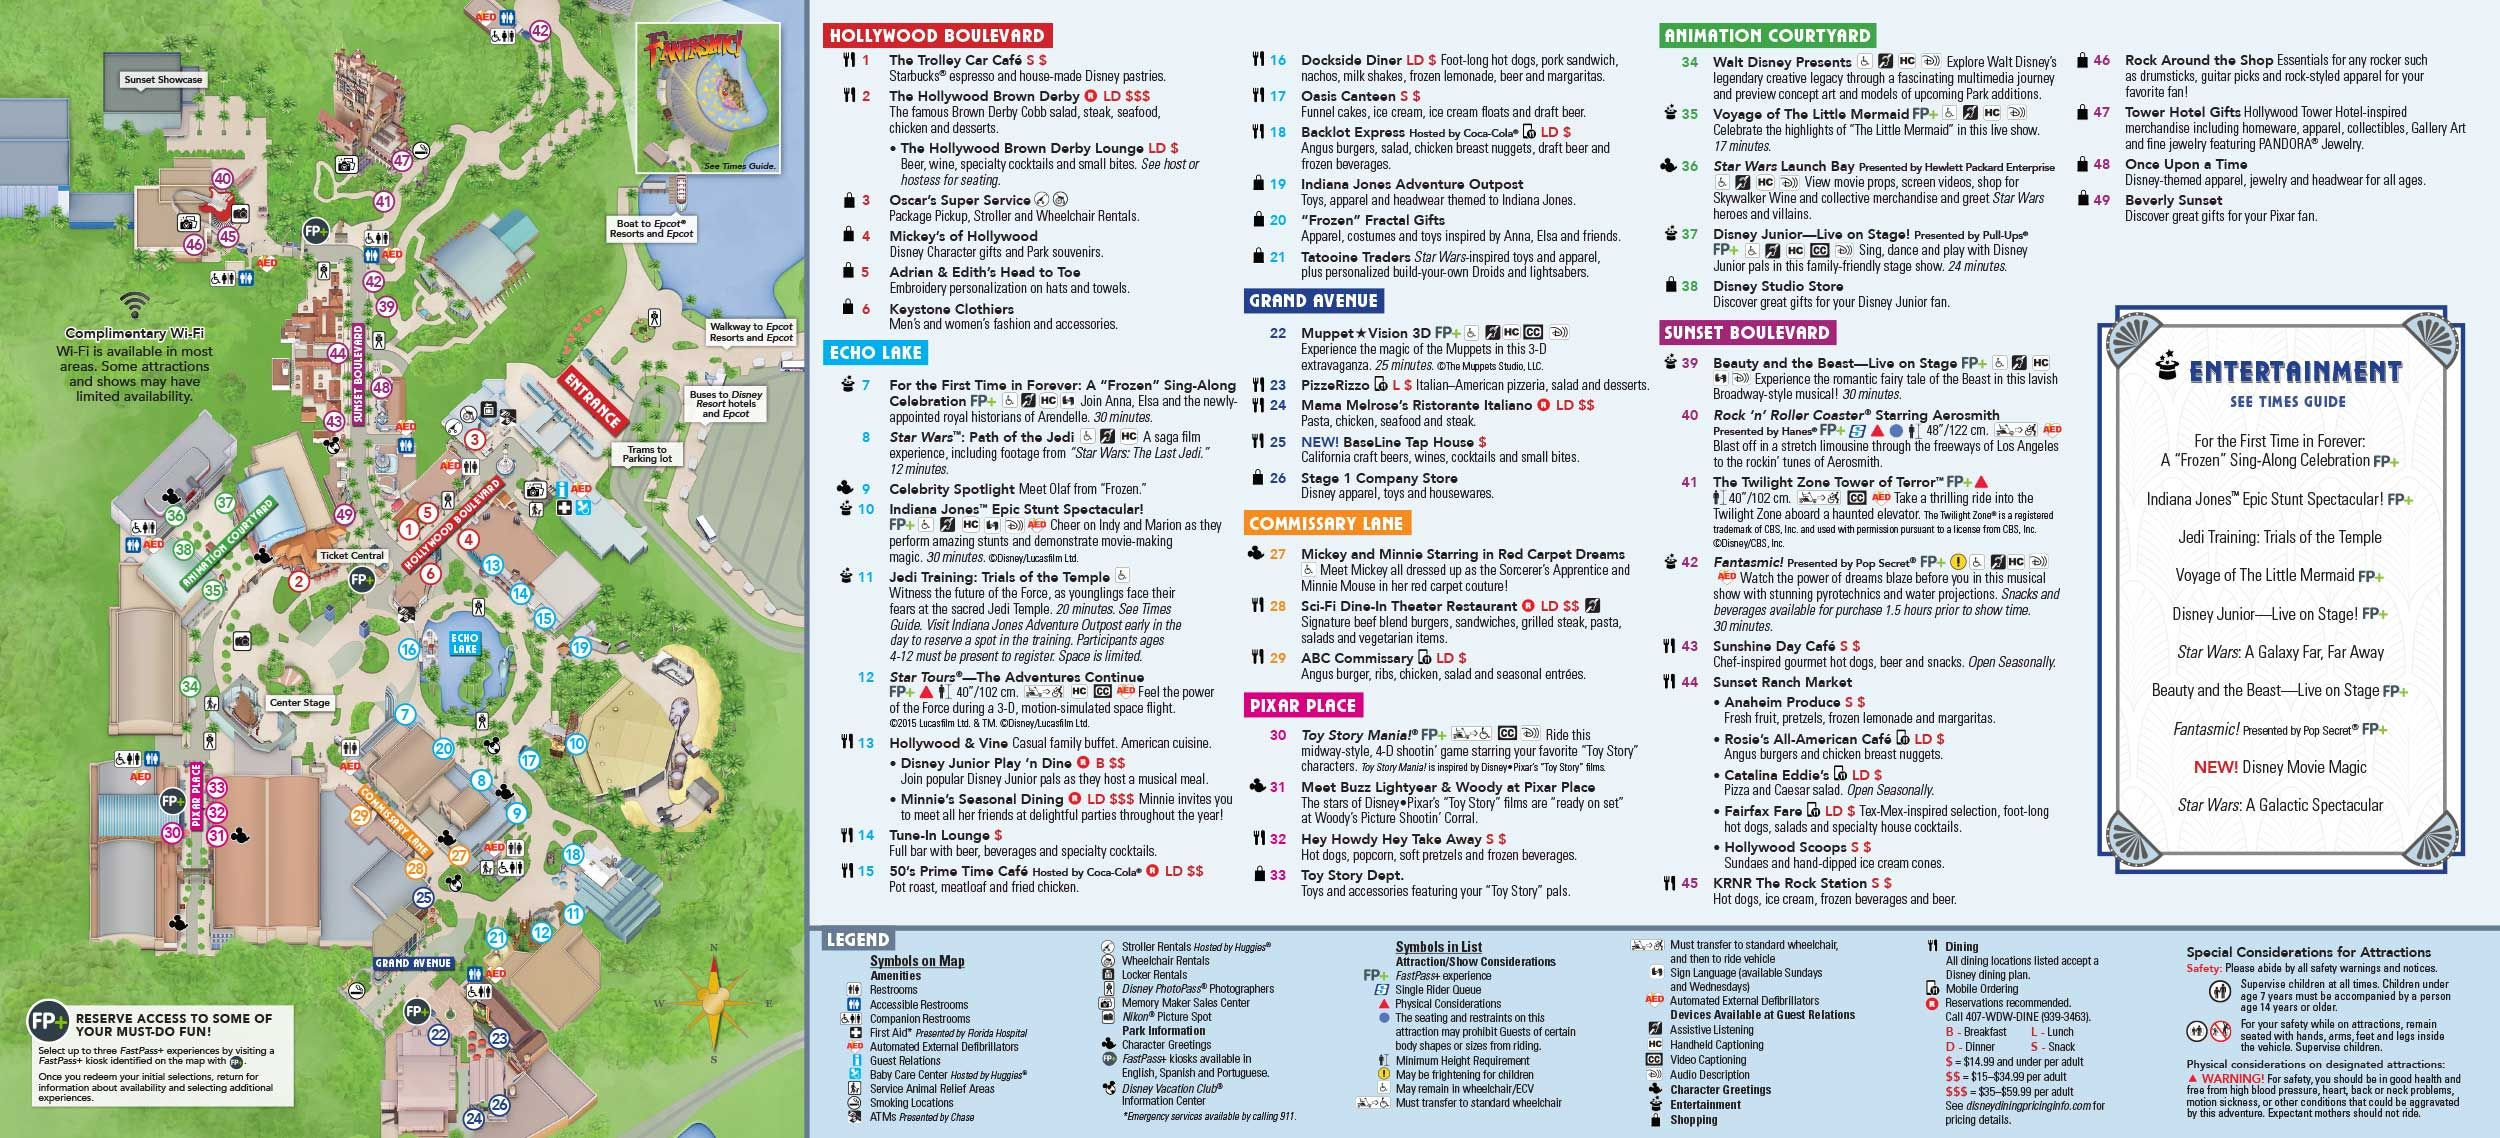 Disney World Map Hollywood Studios.Disney Hollywood Studios Map Disney S Hollywood Studio Planning